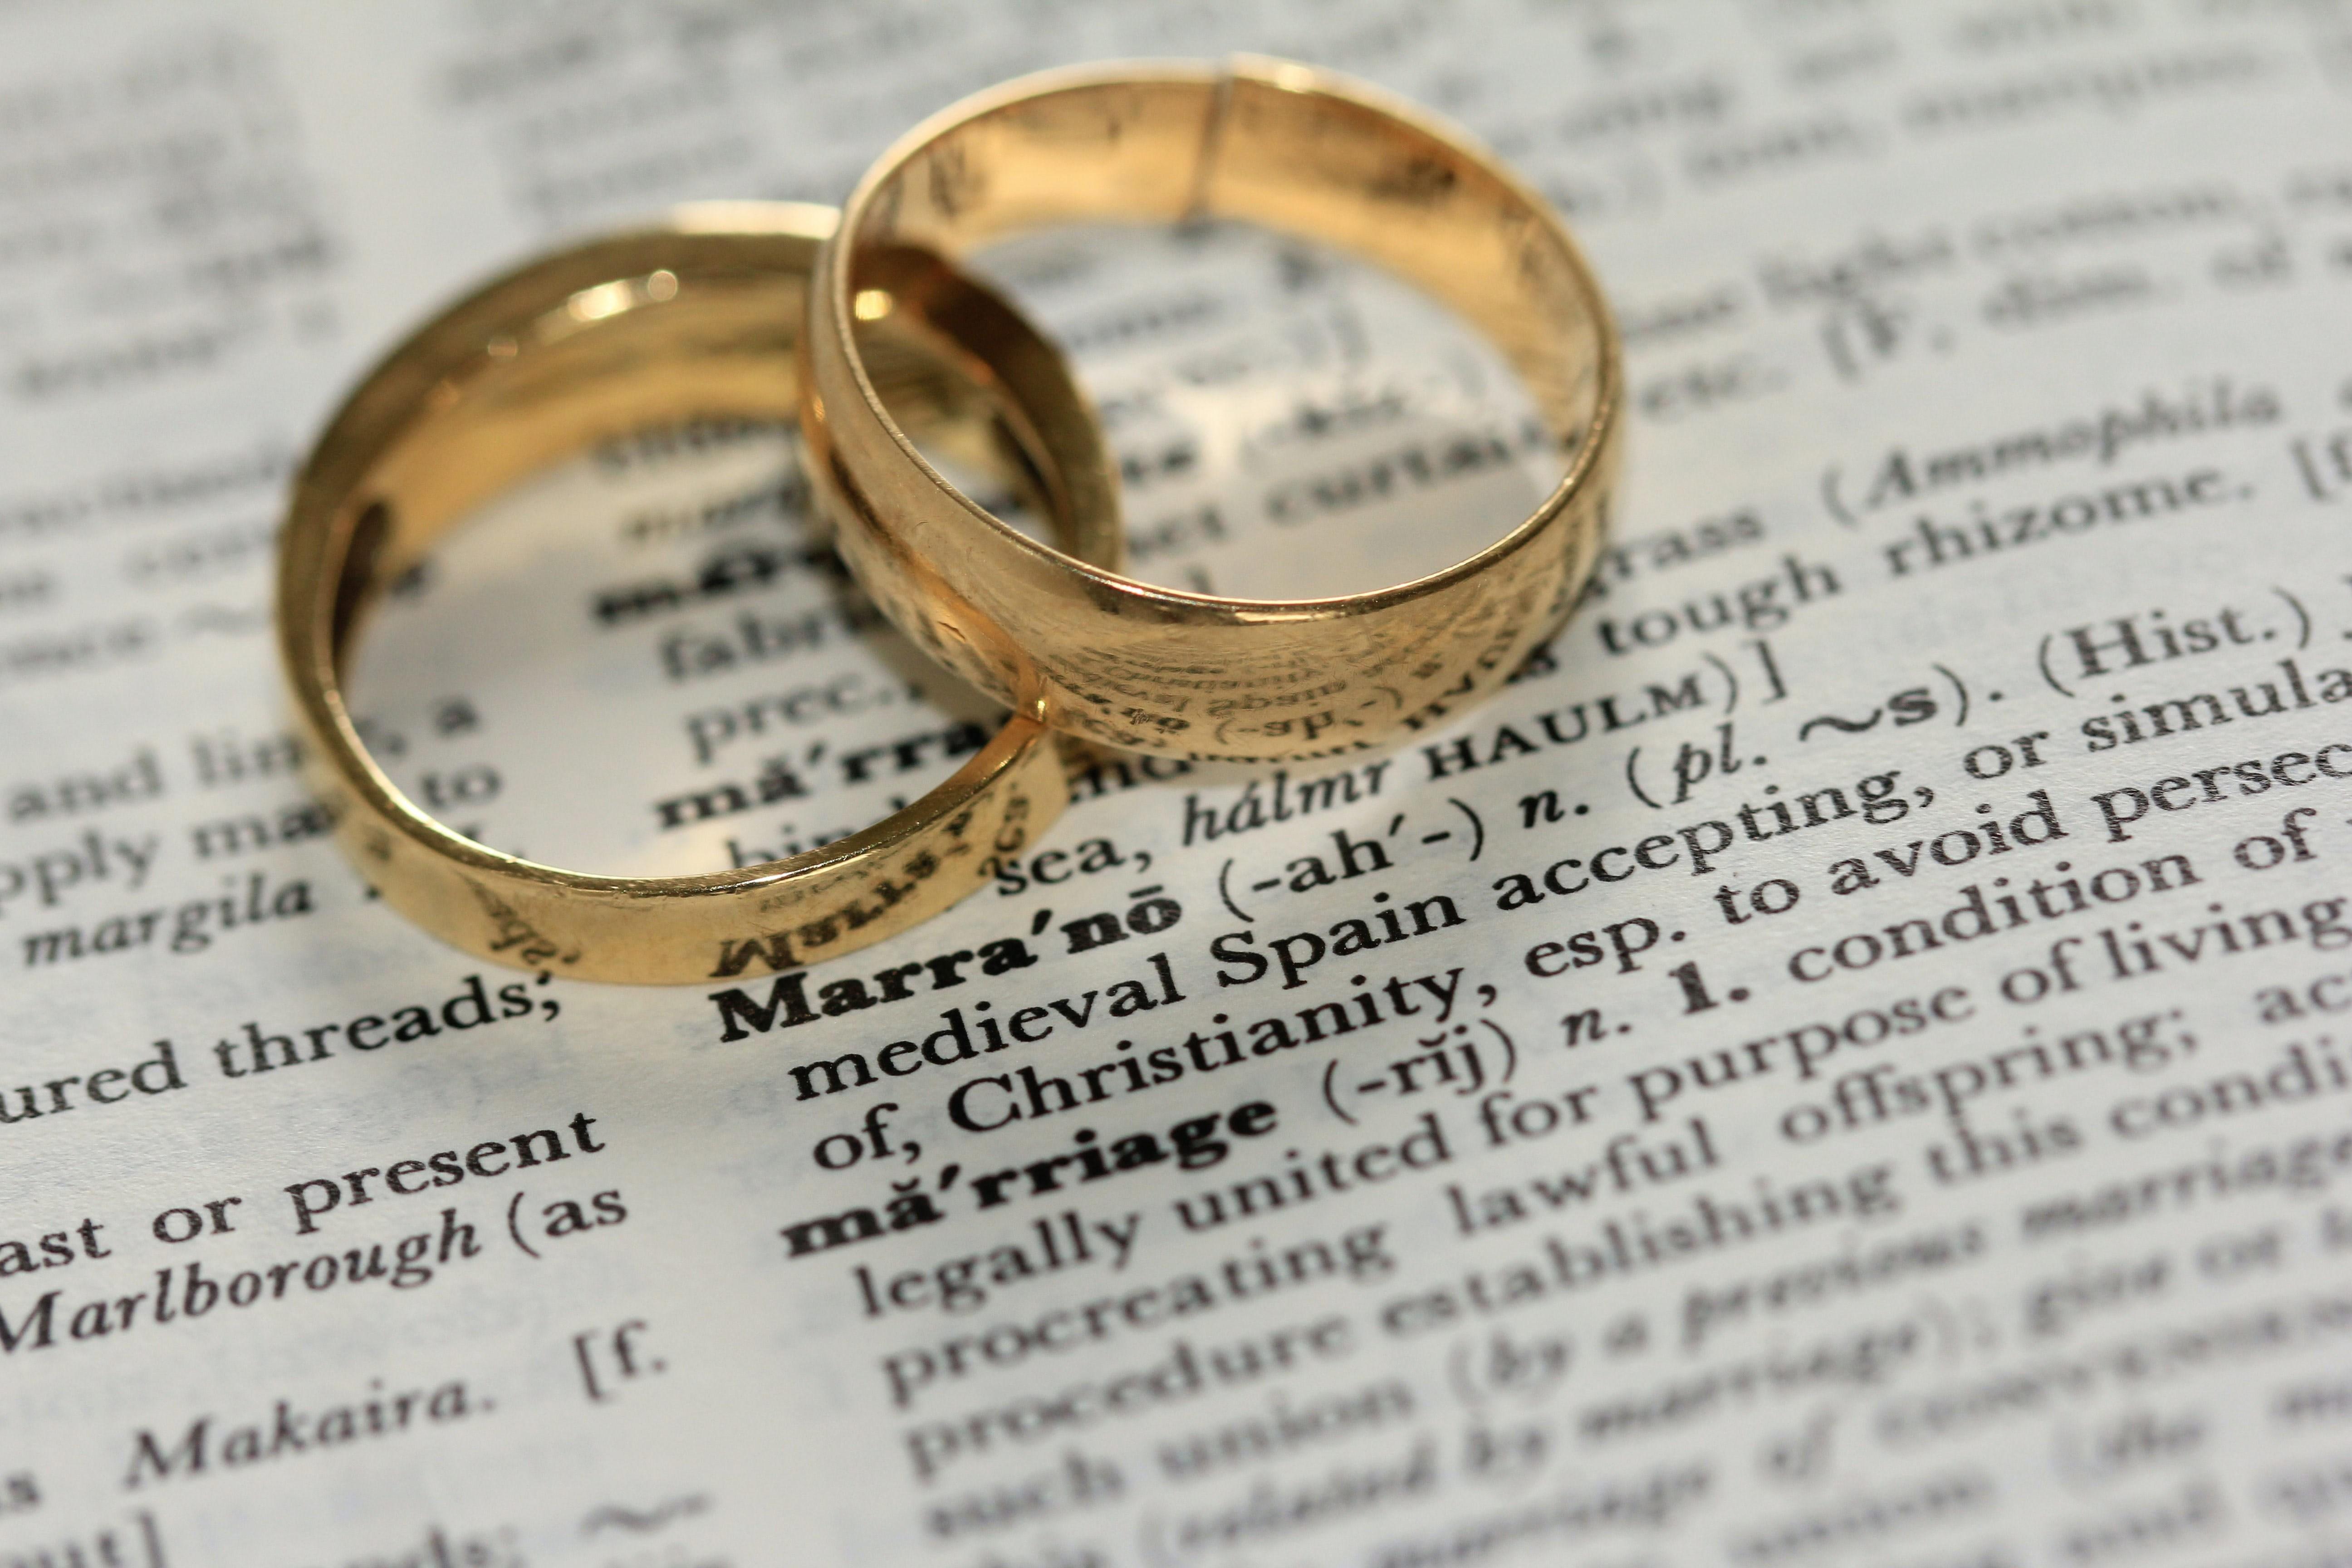 Erbrecht des Ehegatten – Was sagt das Gesetz? - BERATUNG.DE